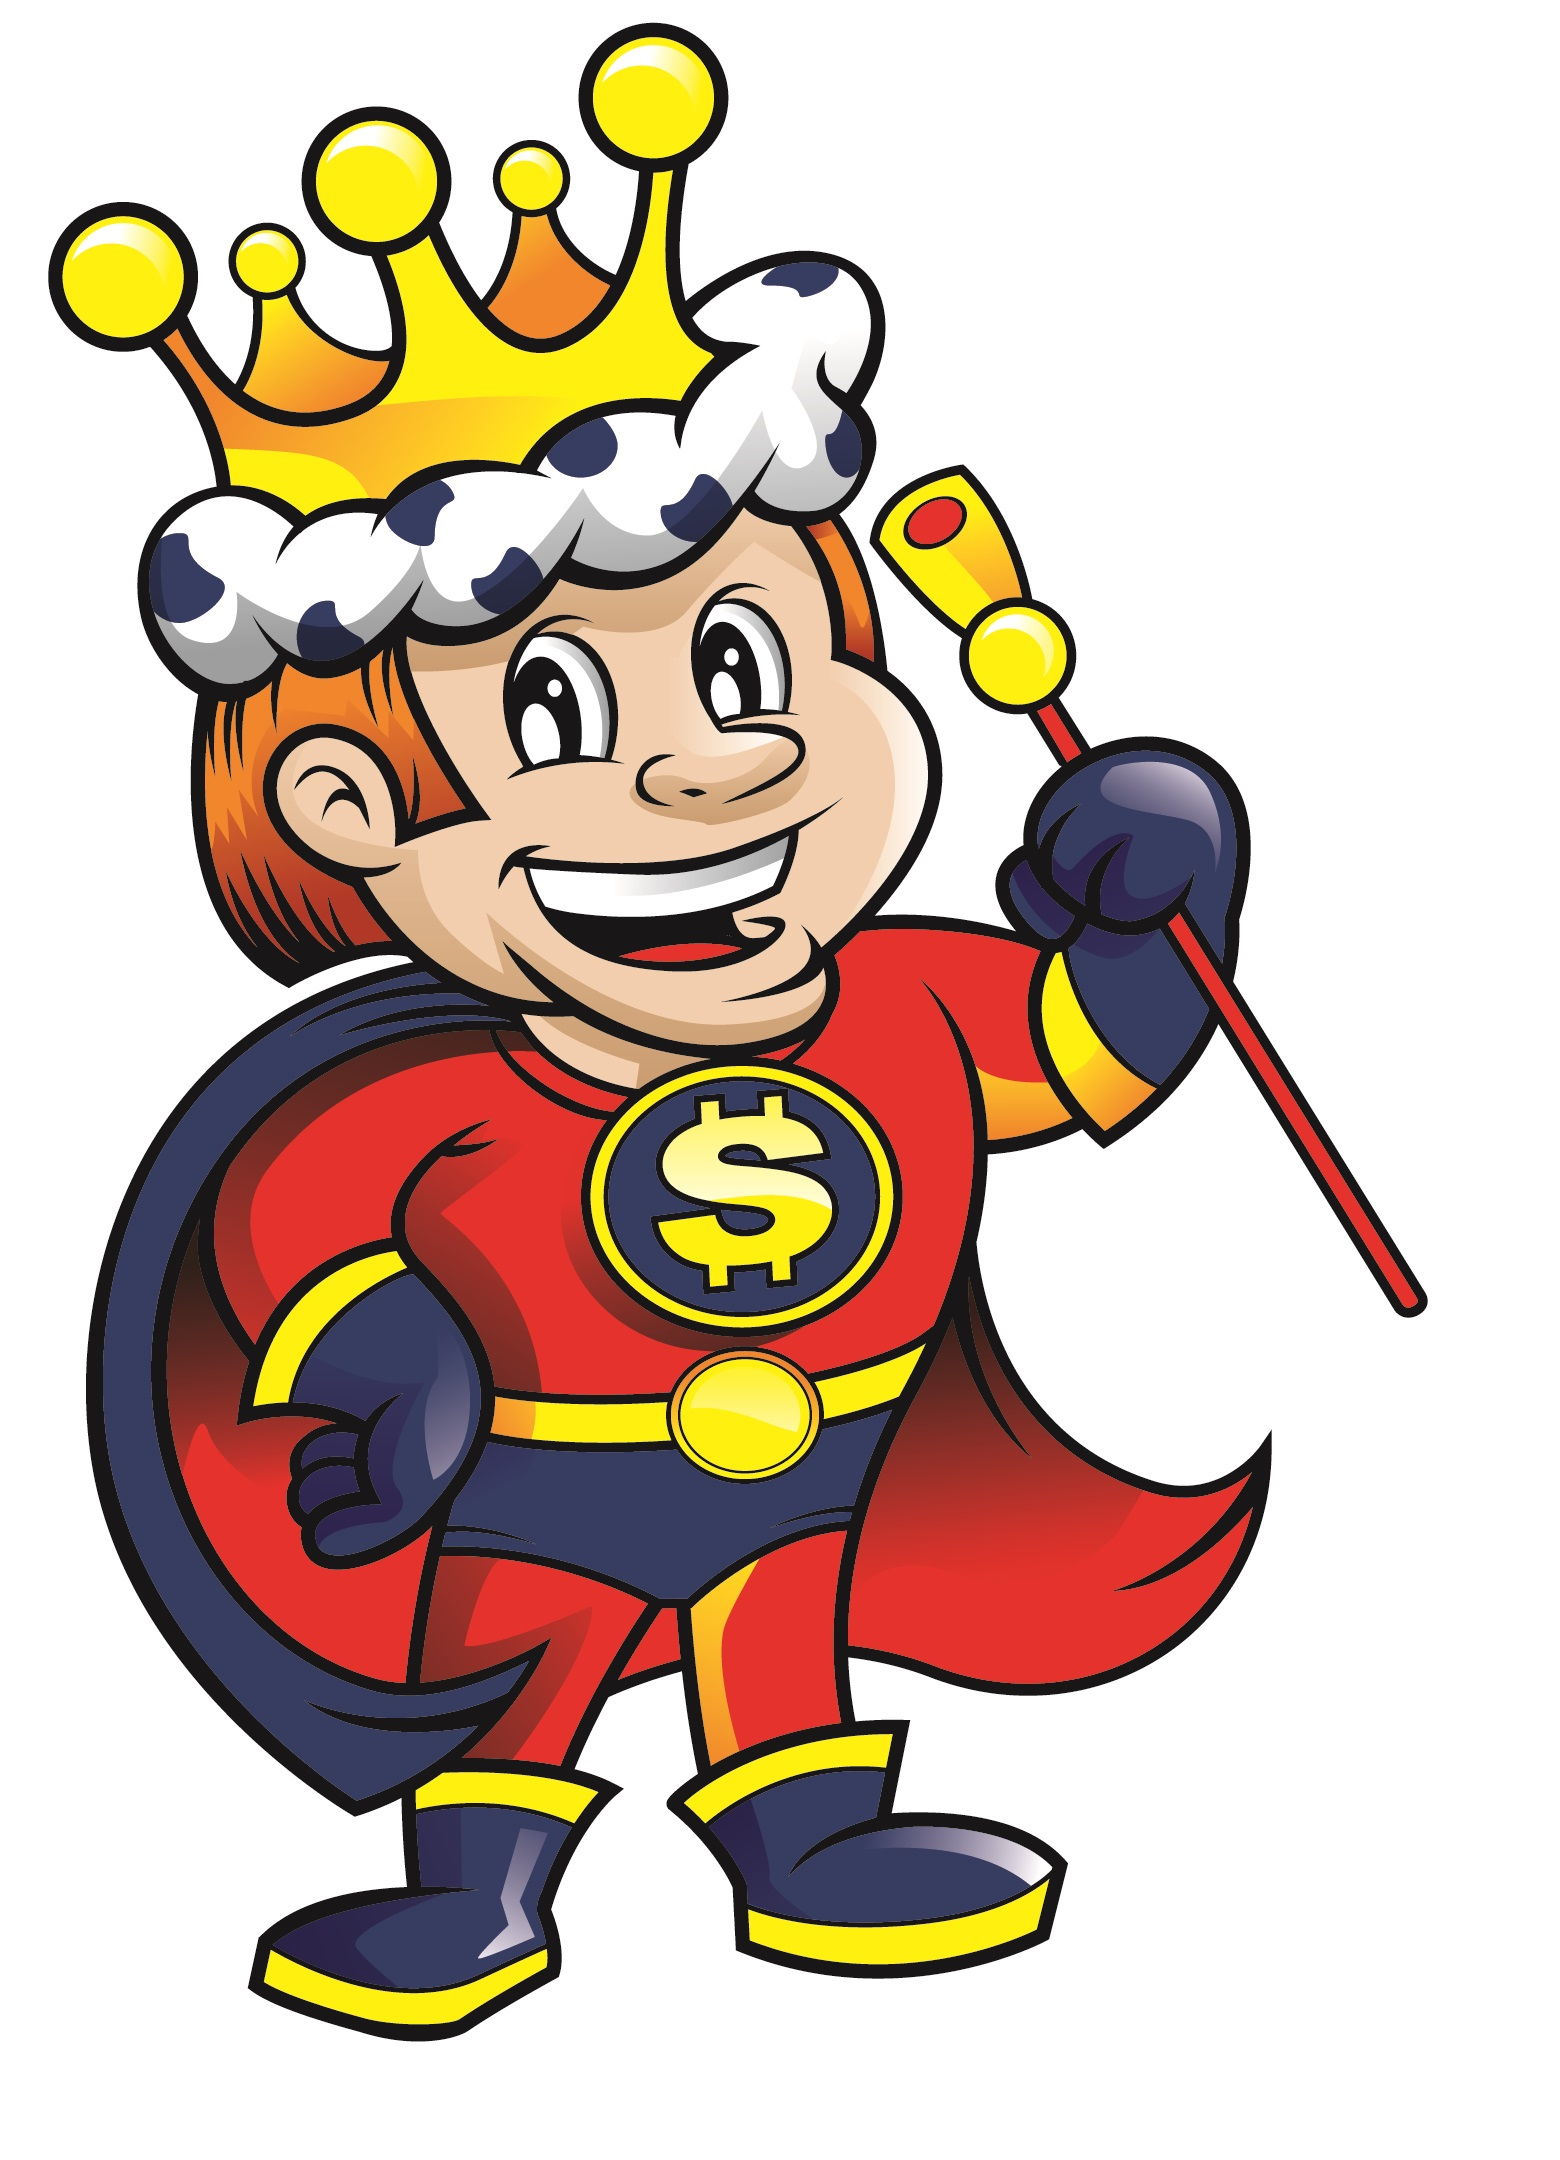 Little Prince Mascot